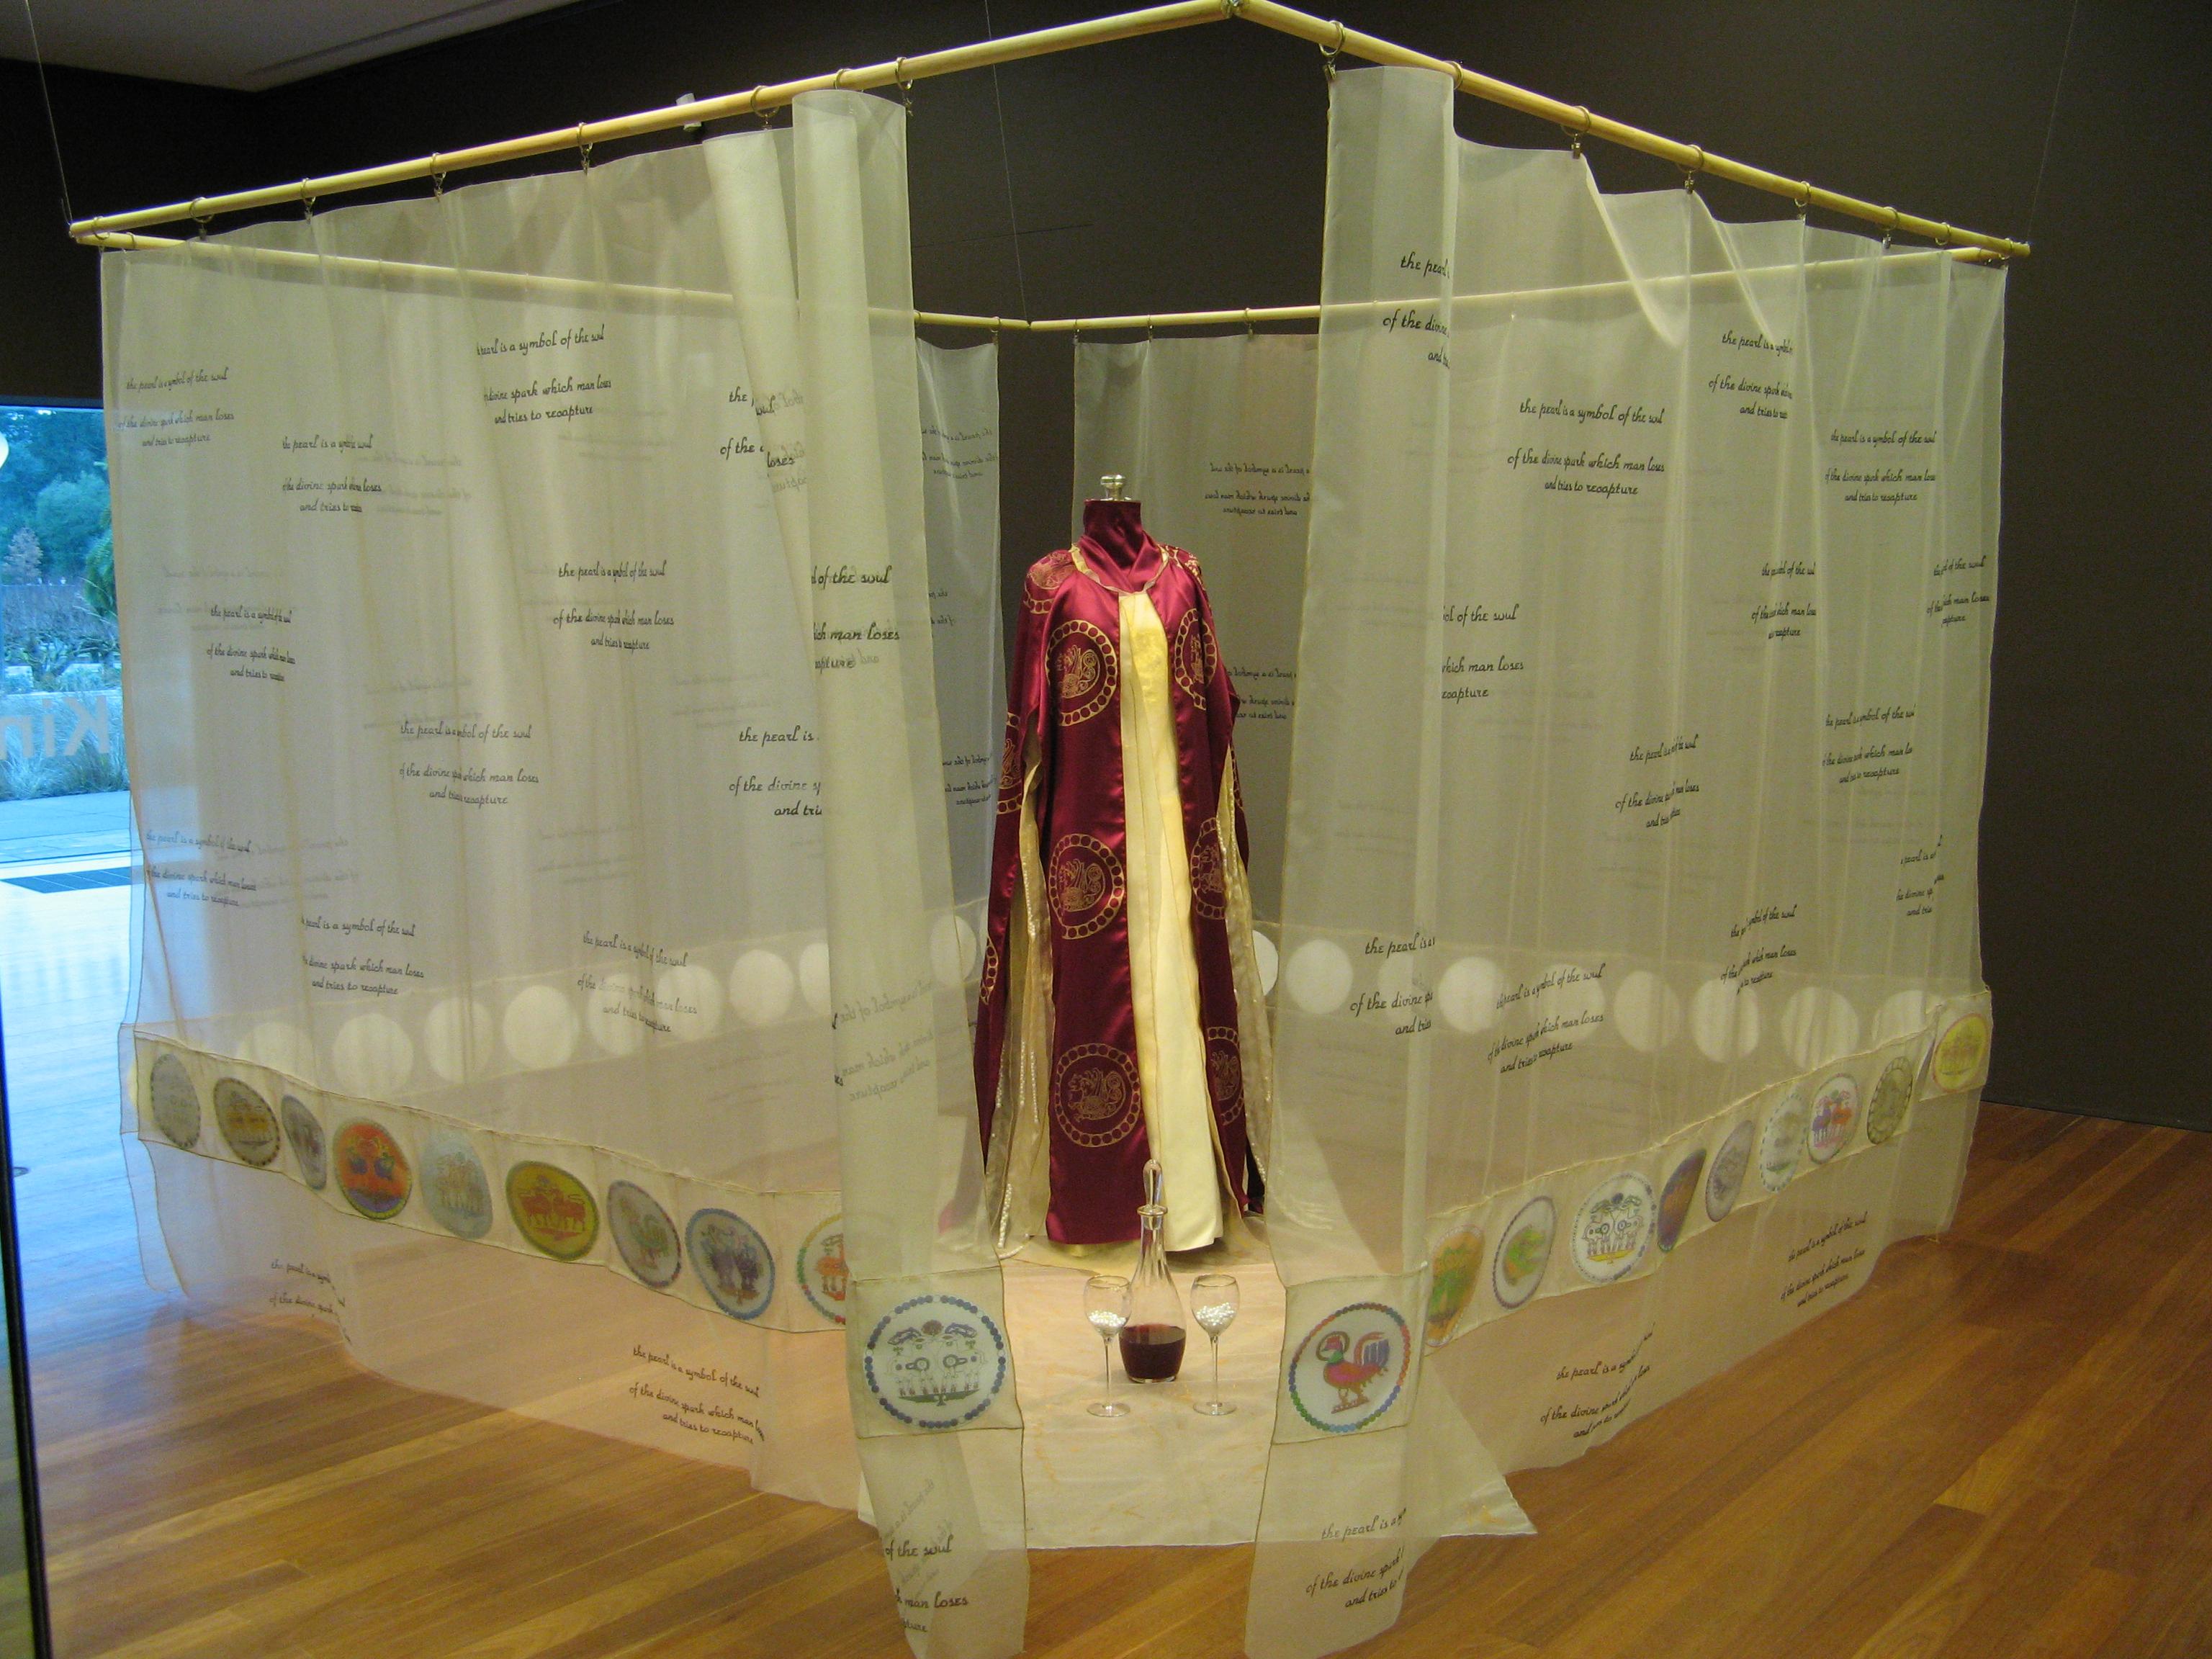 Munroe-Medallion Palace installation